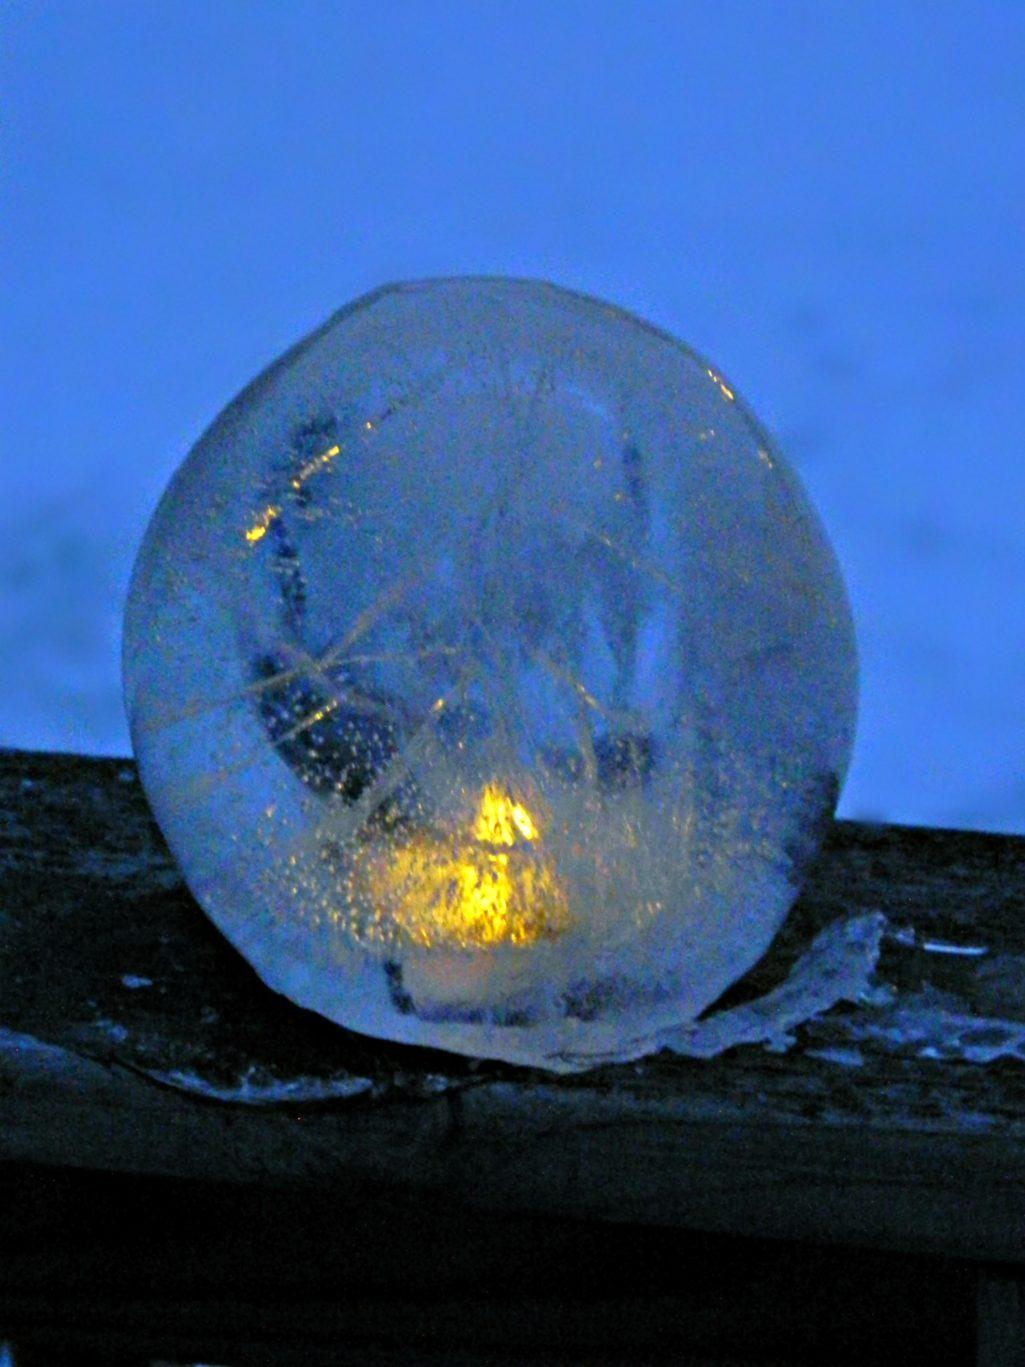 DIY Fire & Ice Lanterns